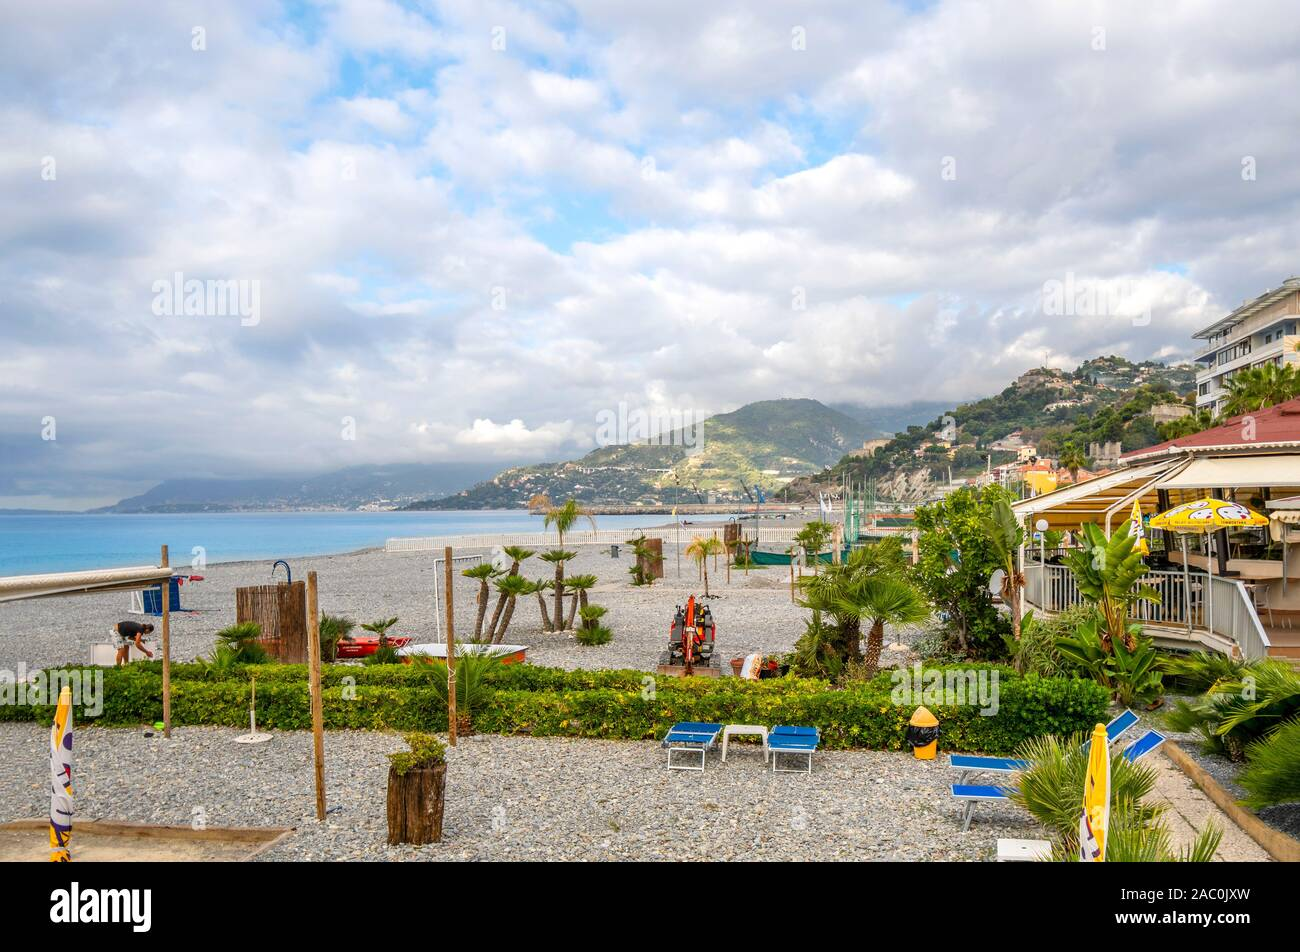 Morning along the resort coast of the Italian Riviera looking towards France at the city of Ventimiglia, Italy. Stock Photo